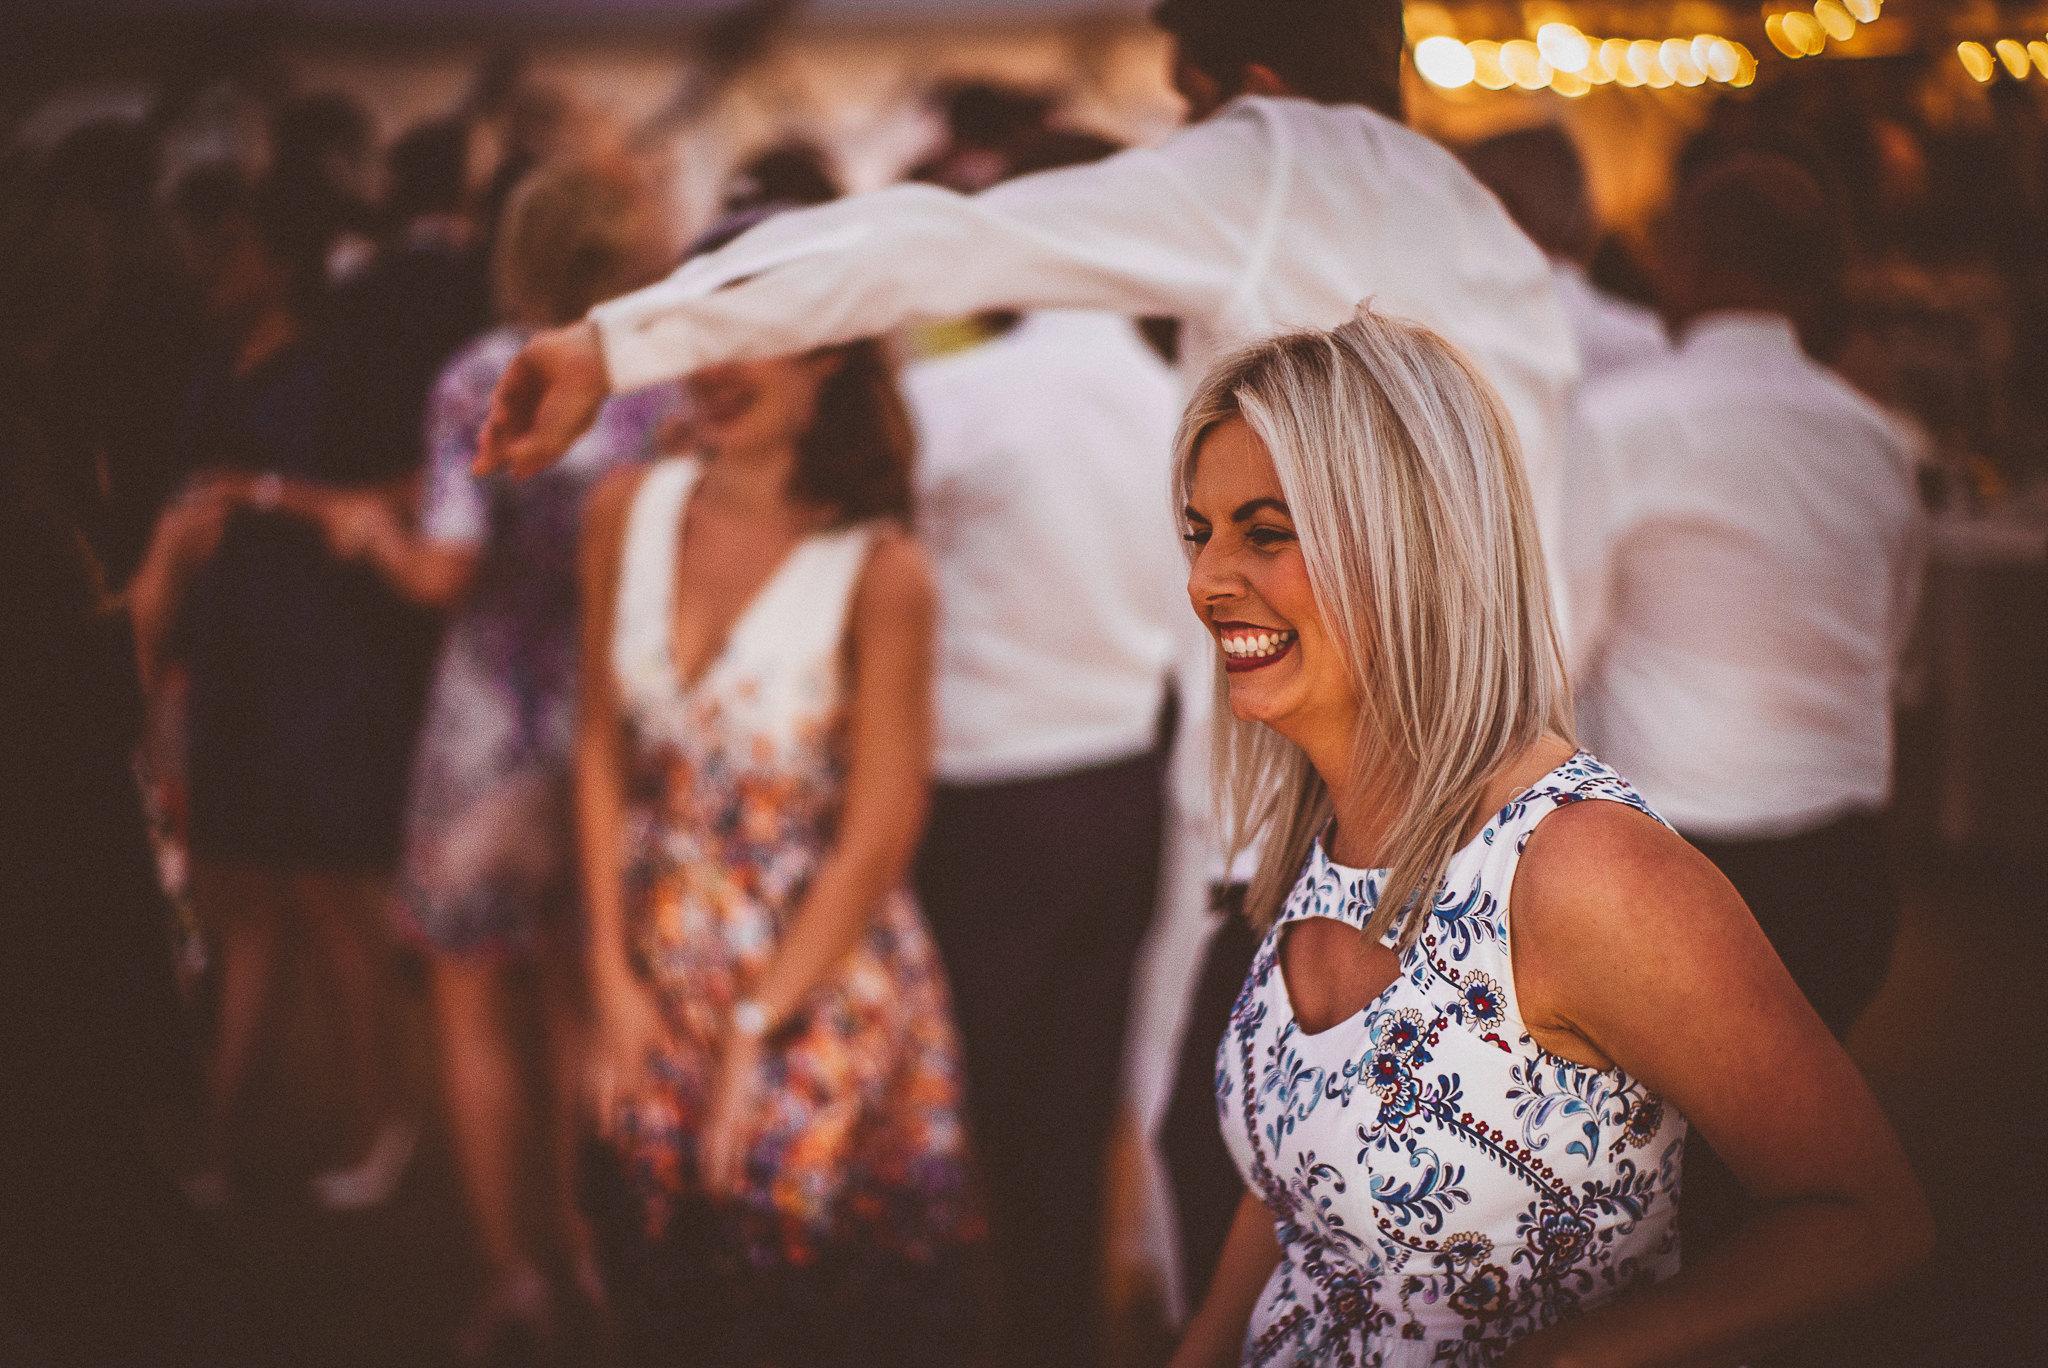 paul-marbrook-Farm-Wedding-Photographer-Lancashire-90106